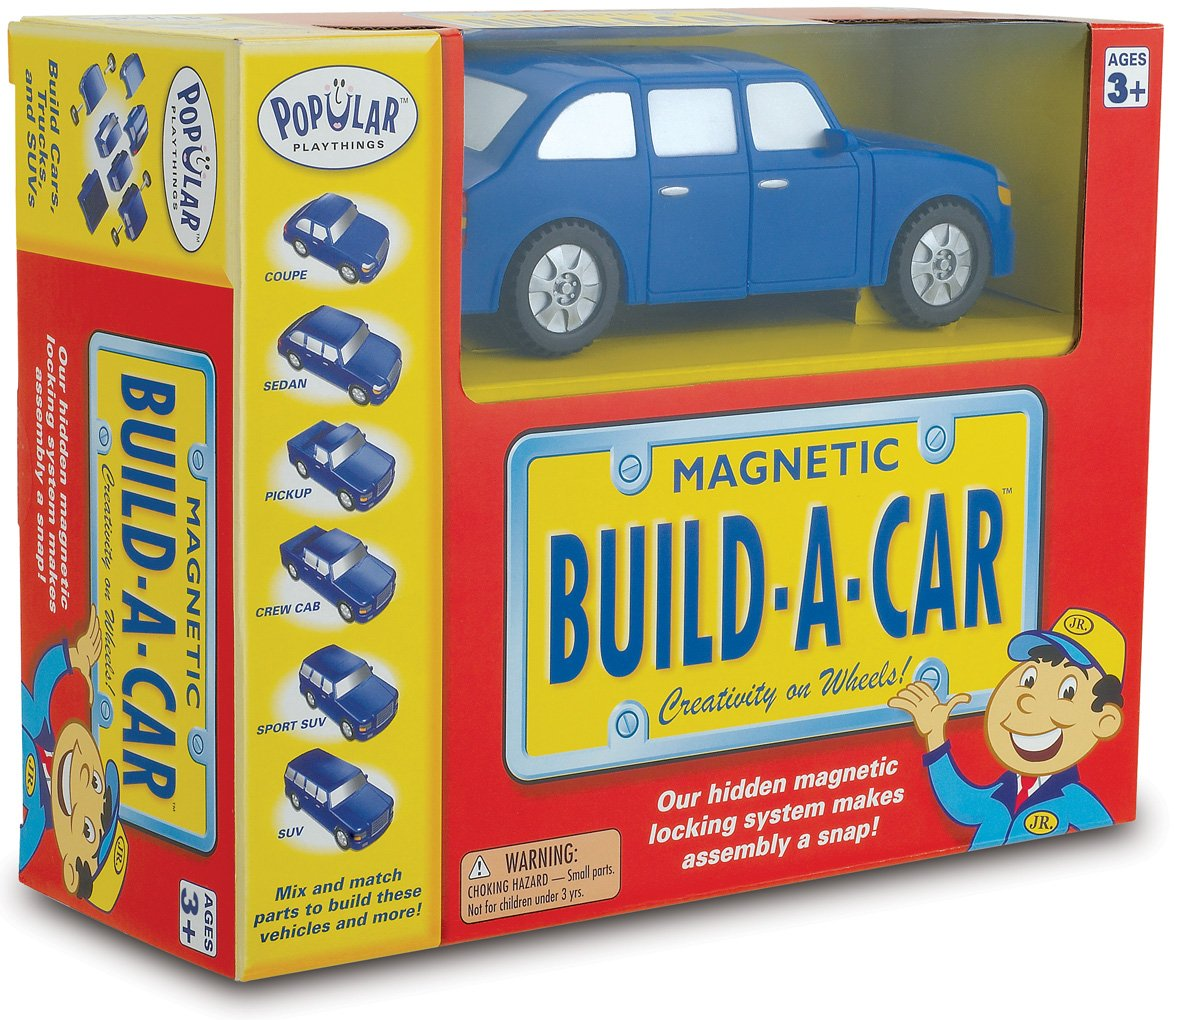 60101 Popular Playthings Magnetic Build-a-Car Huntar Company Inc